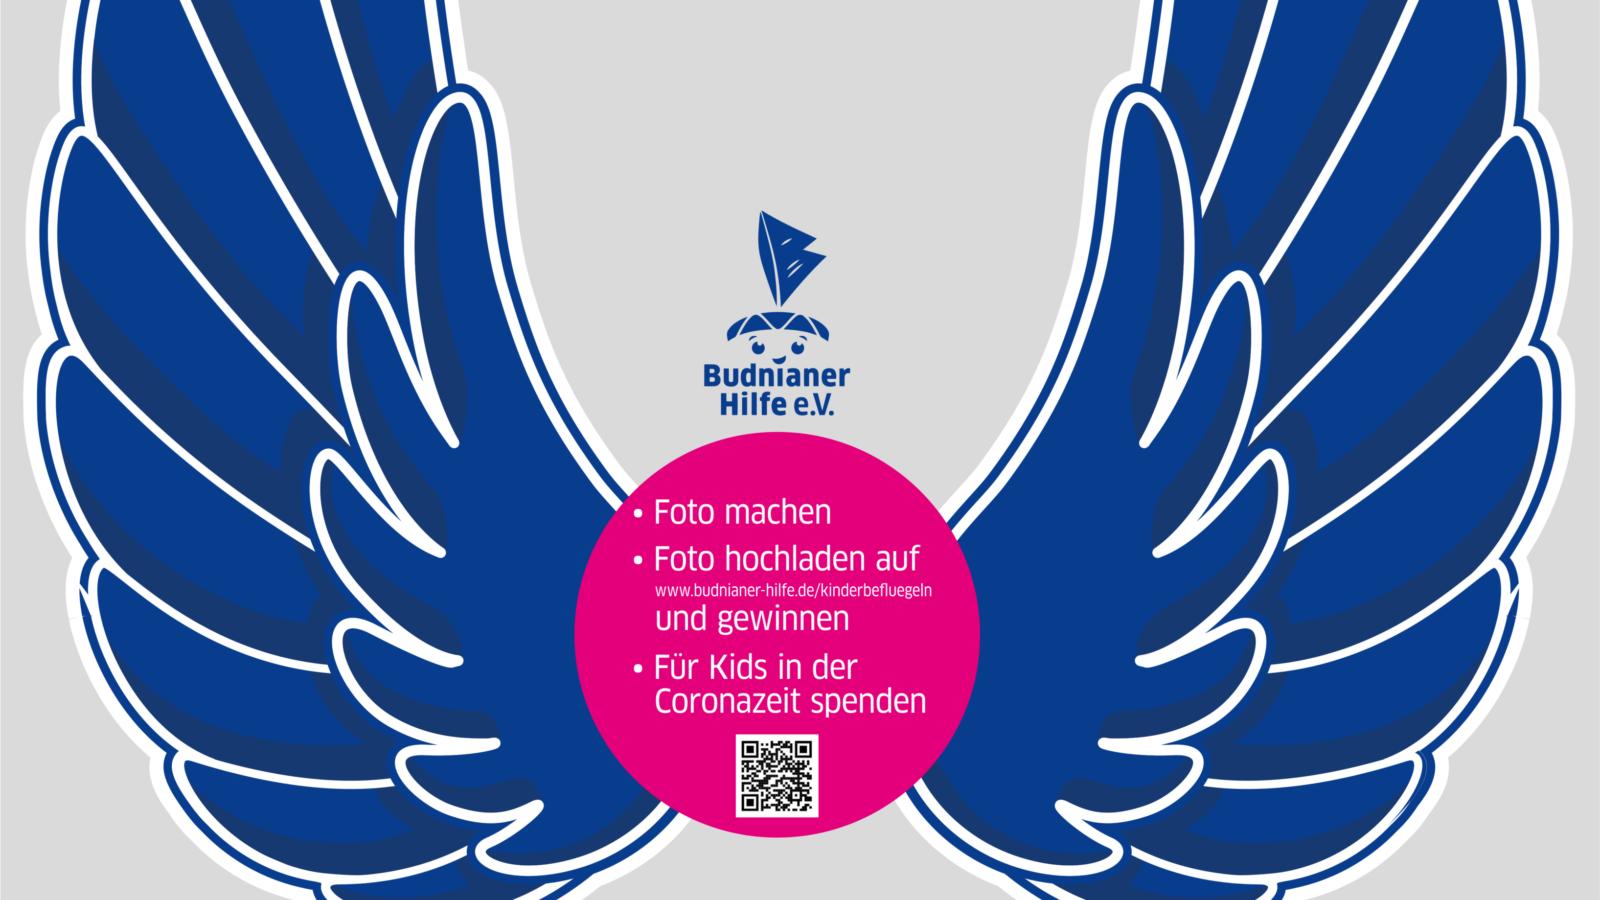 Kinder brauchen Flügel: BUDNIANER HILFE e.V.